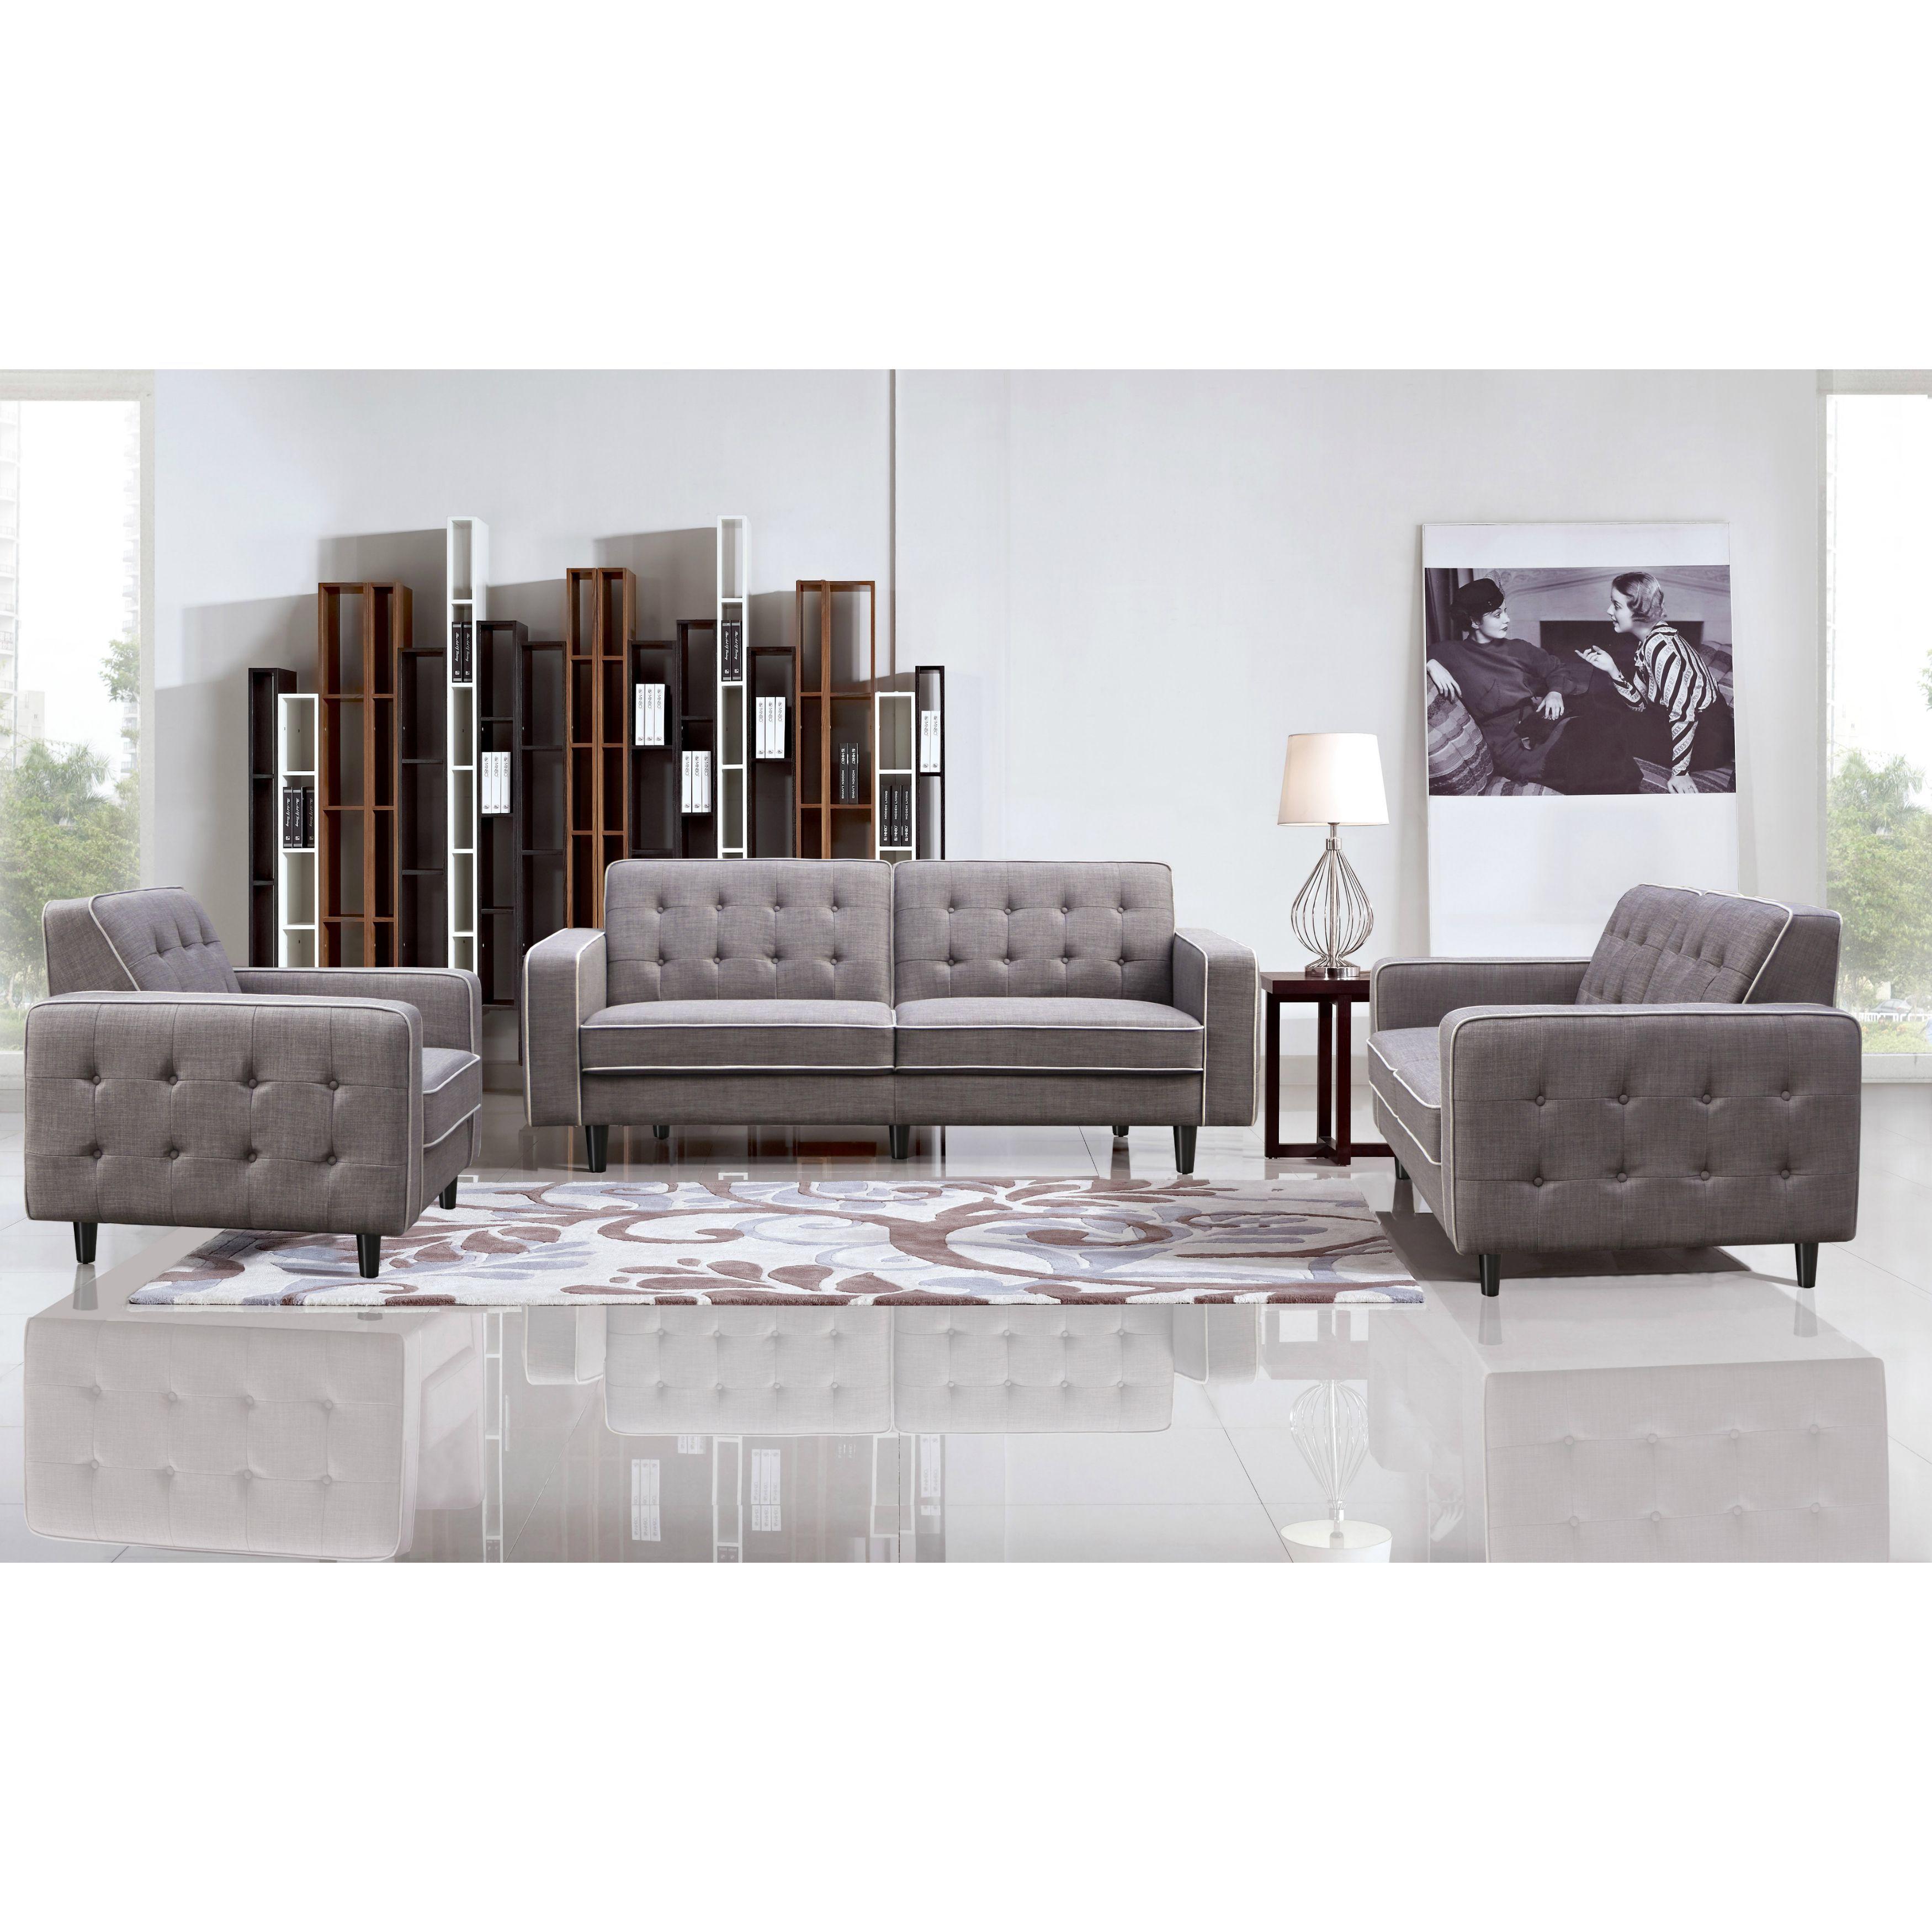 DG Casa Taupe Grey Benjamin Sofa, Loveseat And Chair Set By DG Casa